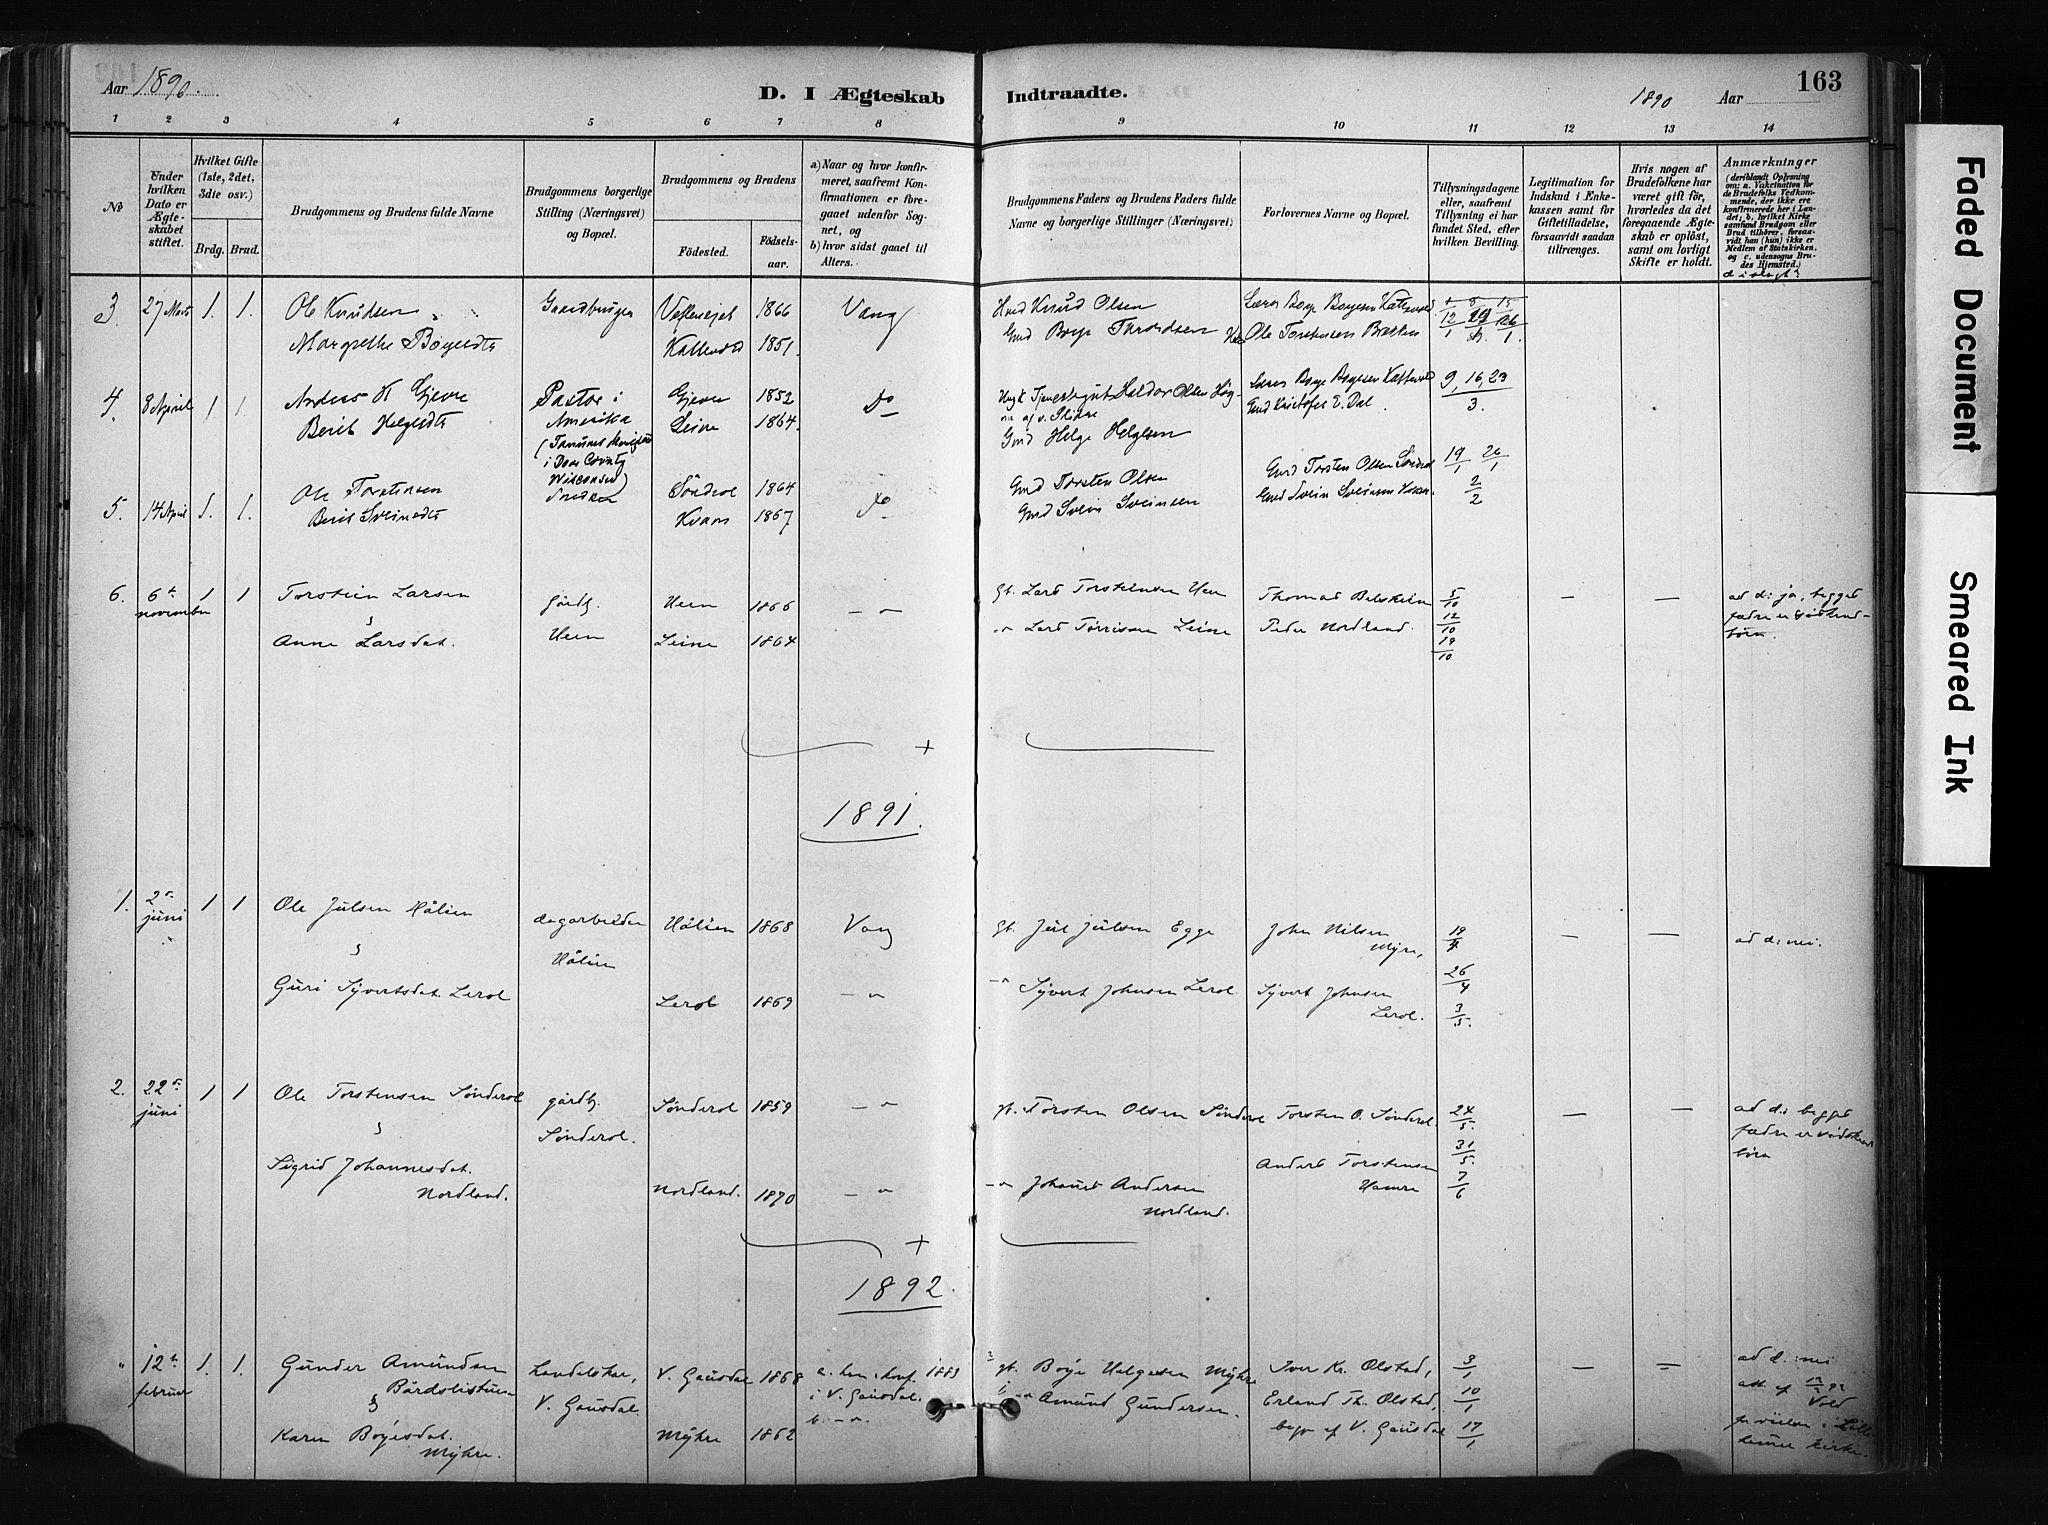 SAH, Vang prestekontor, Valdres, Parish register (official) no. 8, 1882-1910, p. 163